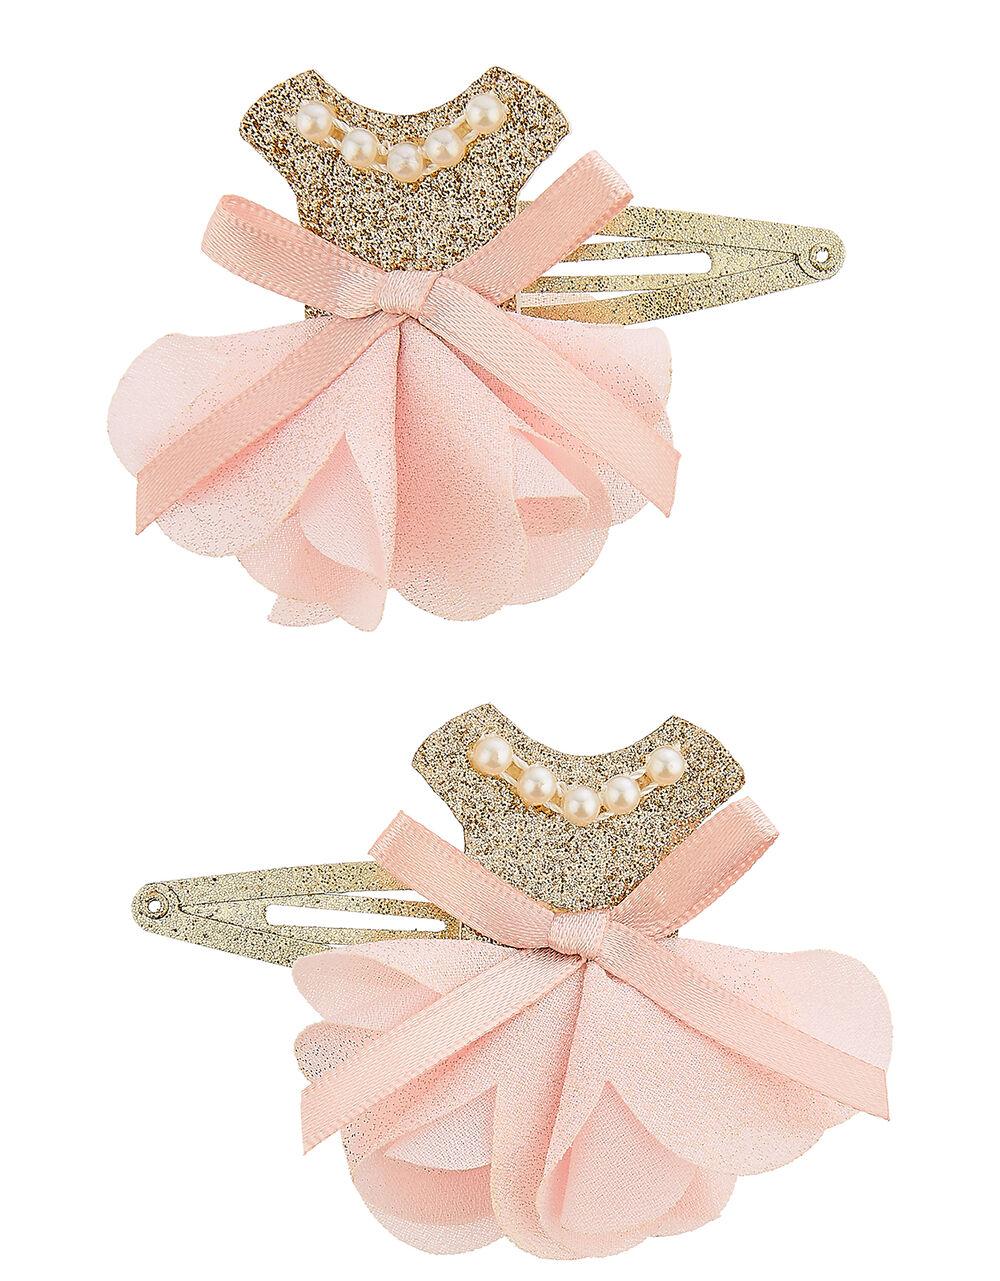 Valentina Ballerina Sparkle Hair Clips, , large